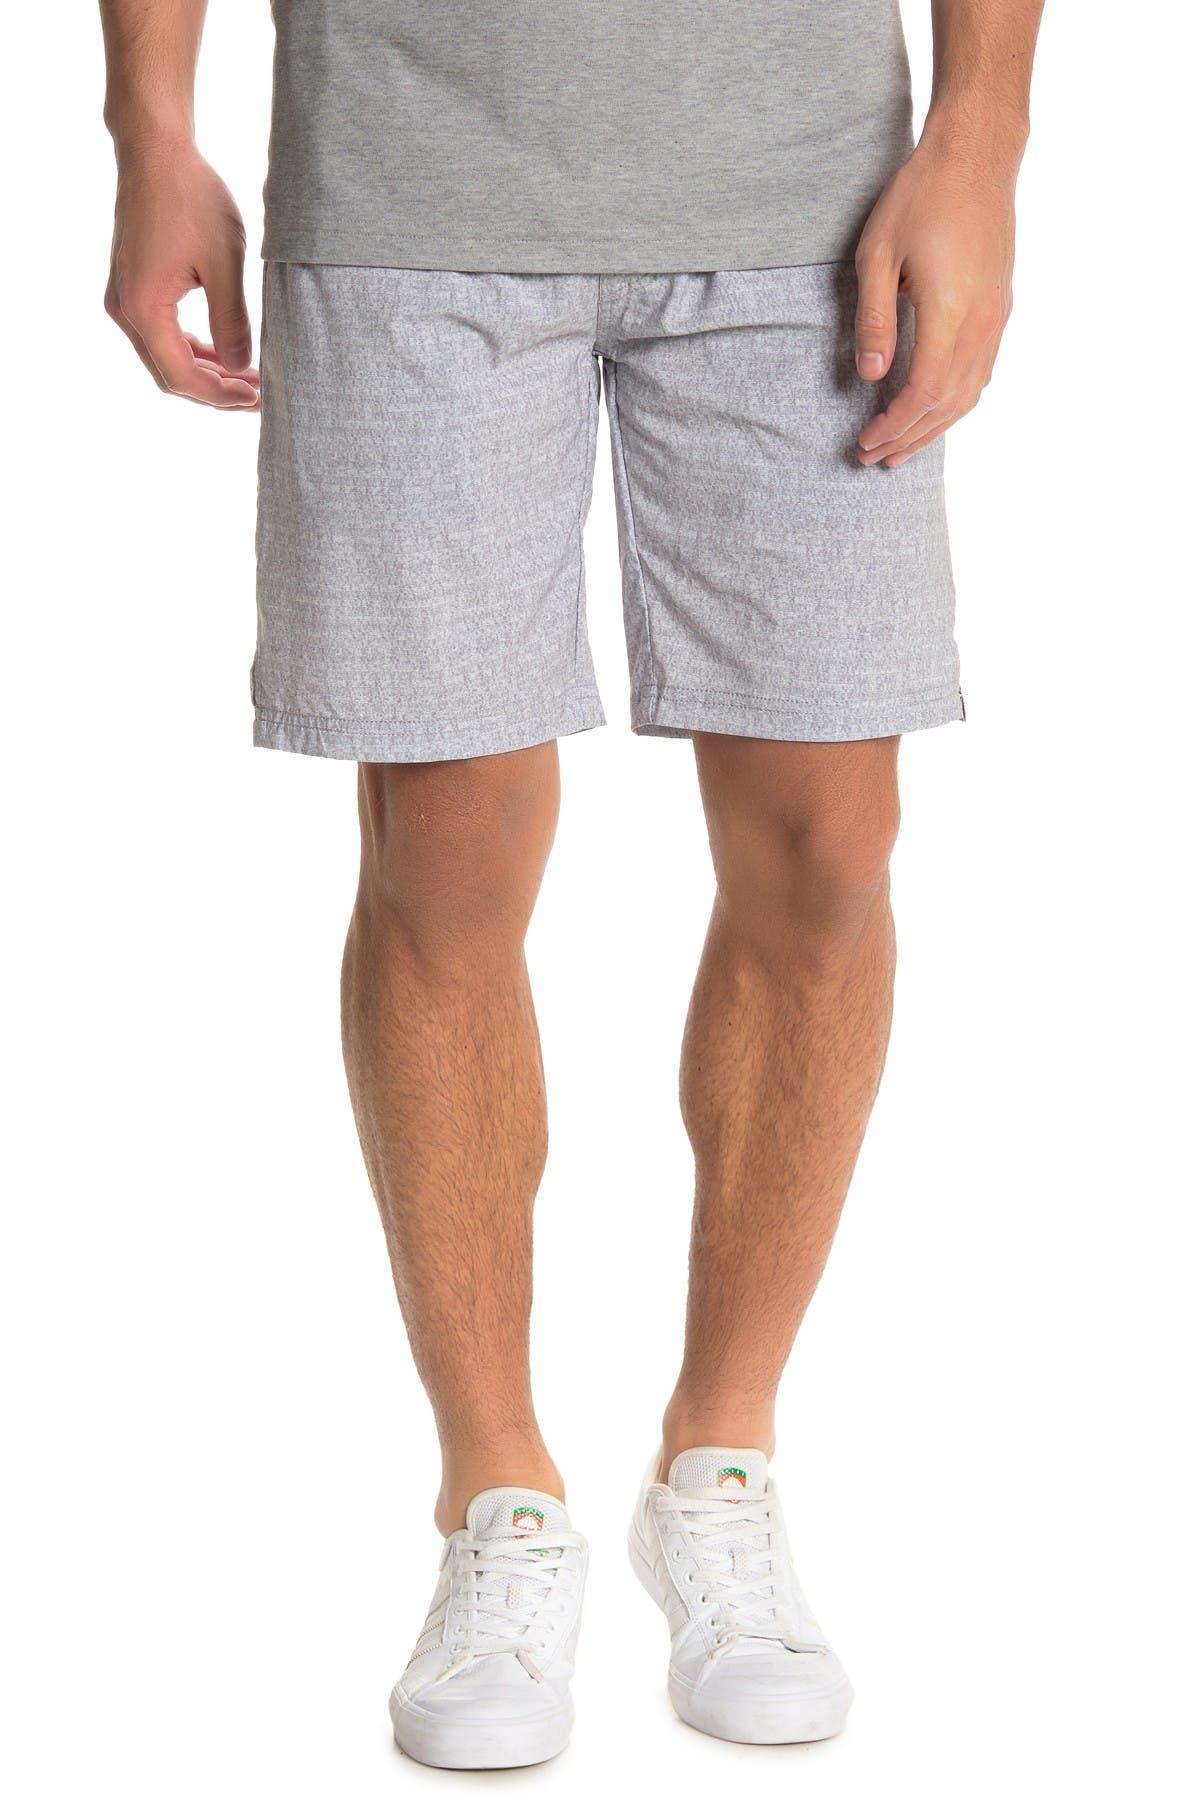 Image of TRAVIS MATHEW Stratum Shorts